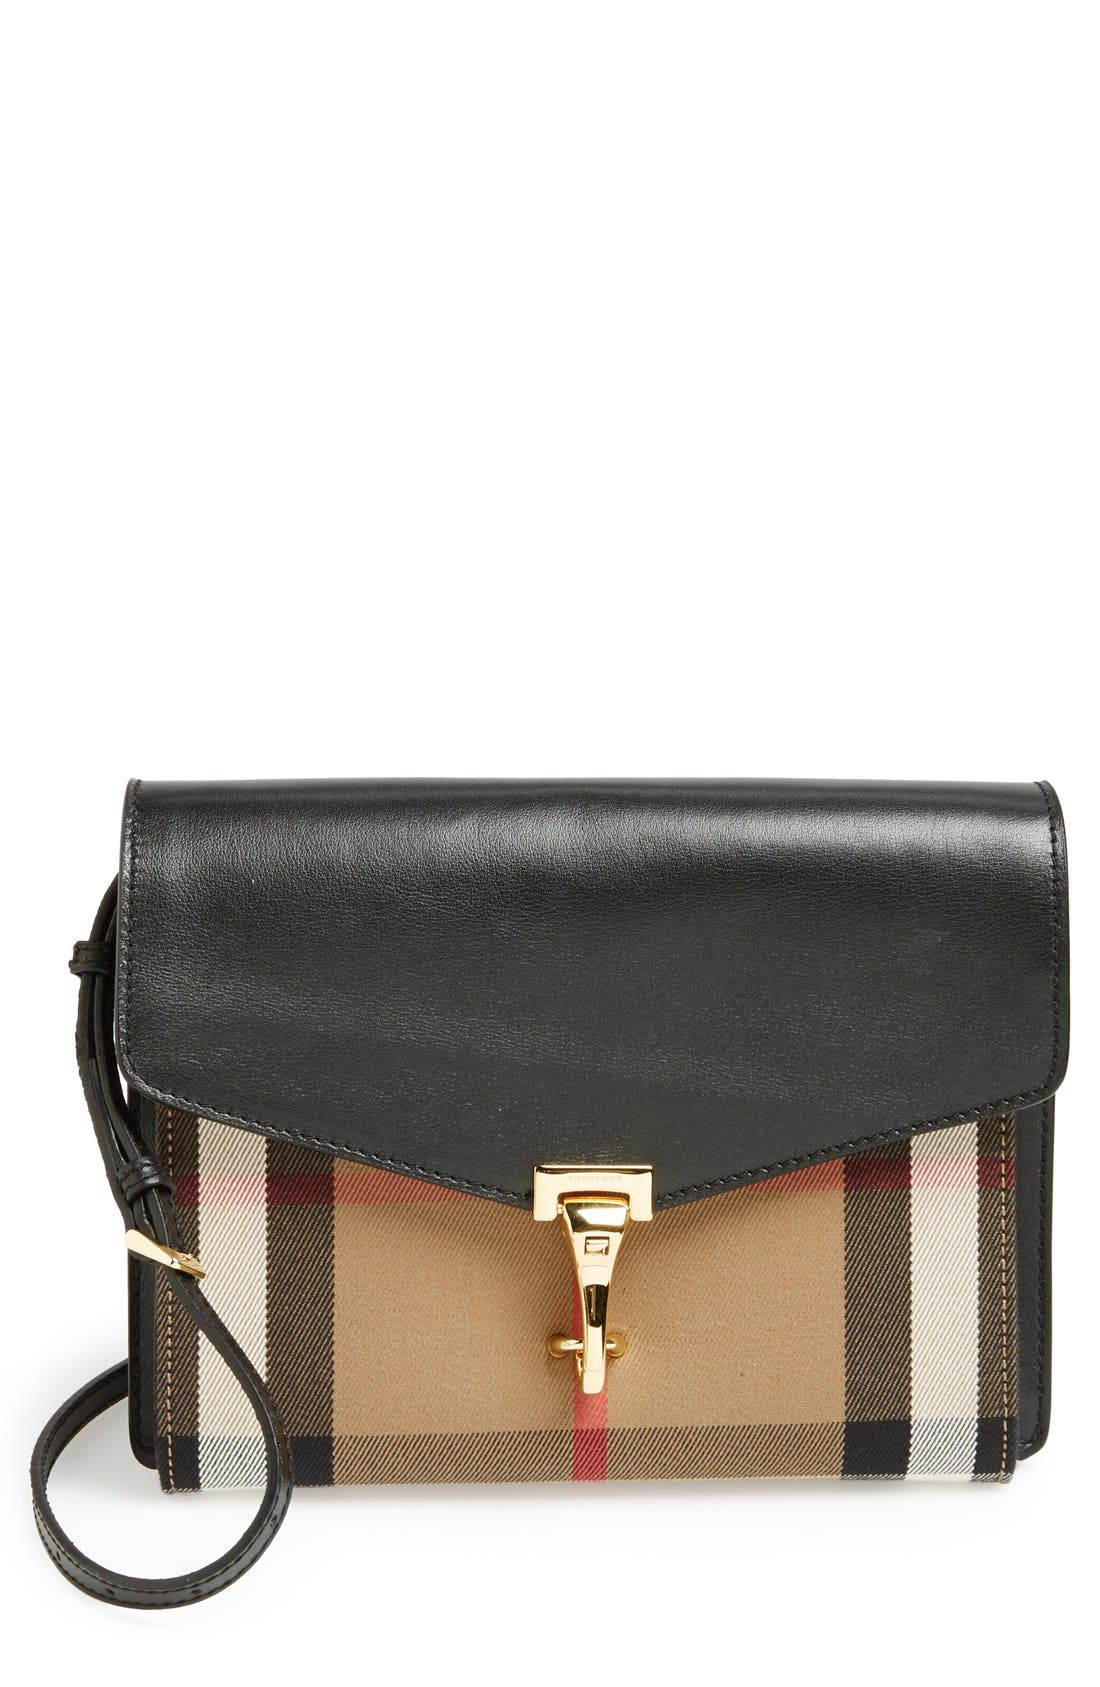 Main Image - Burberry 'Small Macken' Crossbody Bag